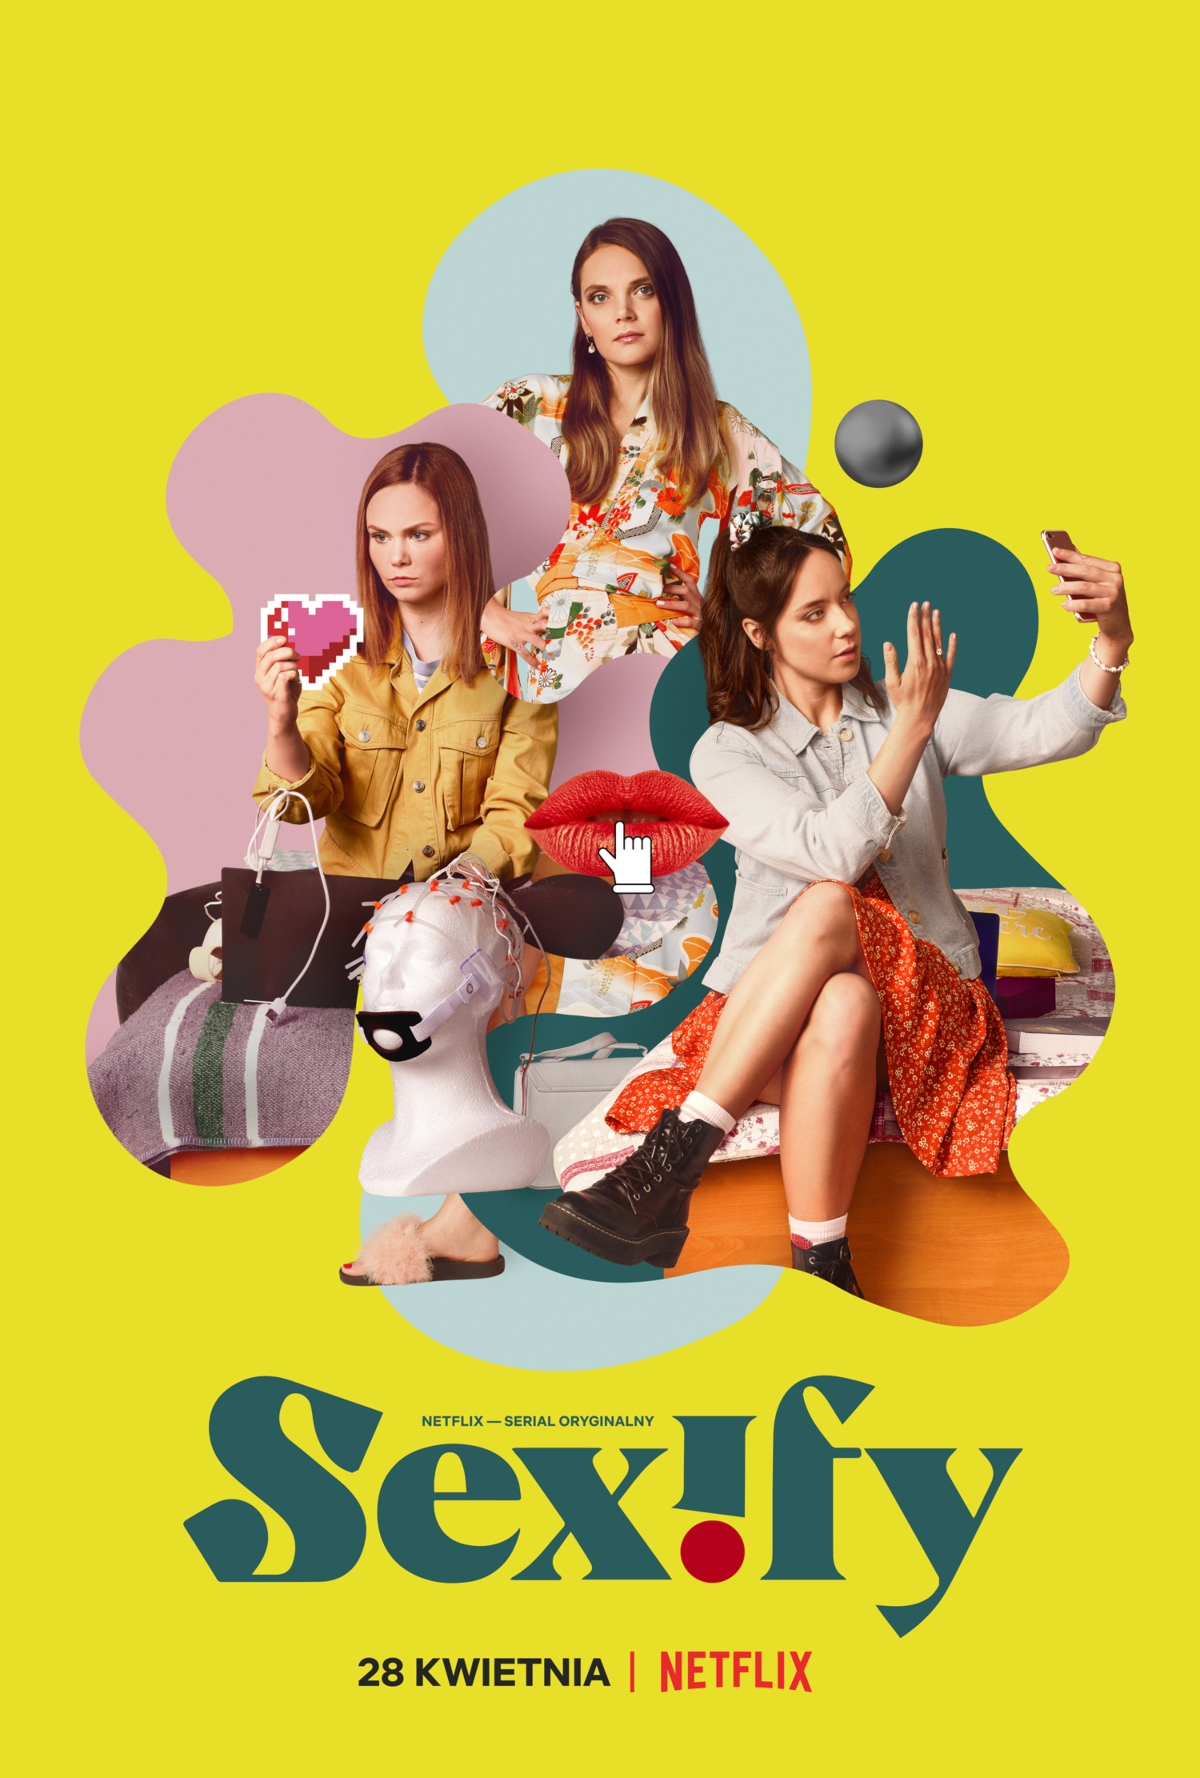 Sexify (2021) S01 E01 to 08 English Netflix Original Series 900MB HDRip 480p Download